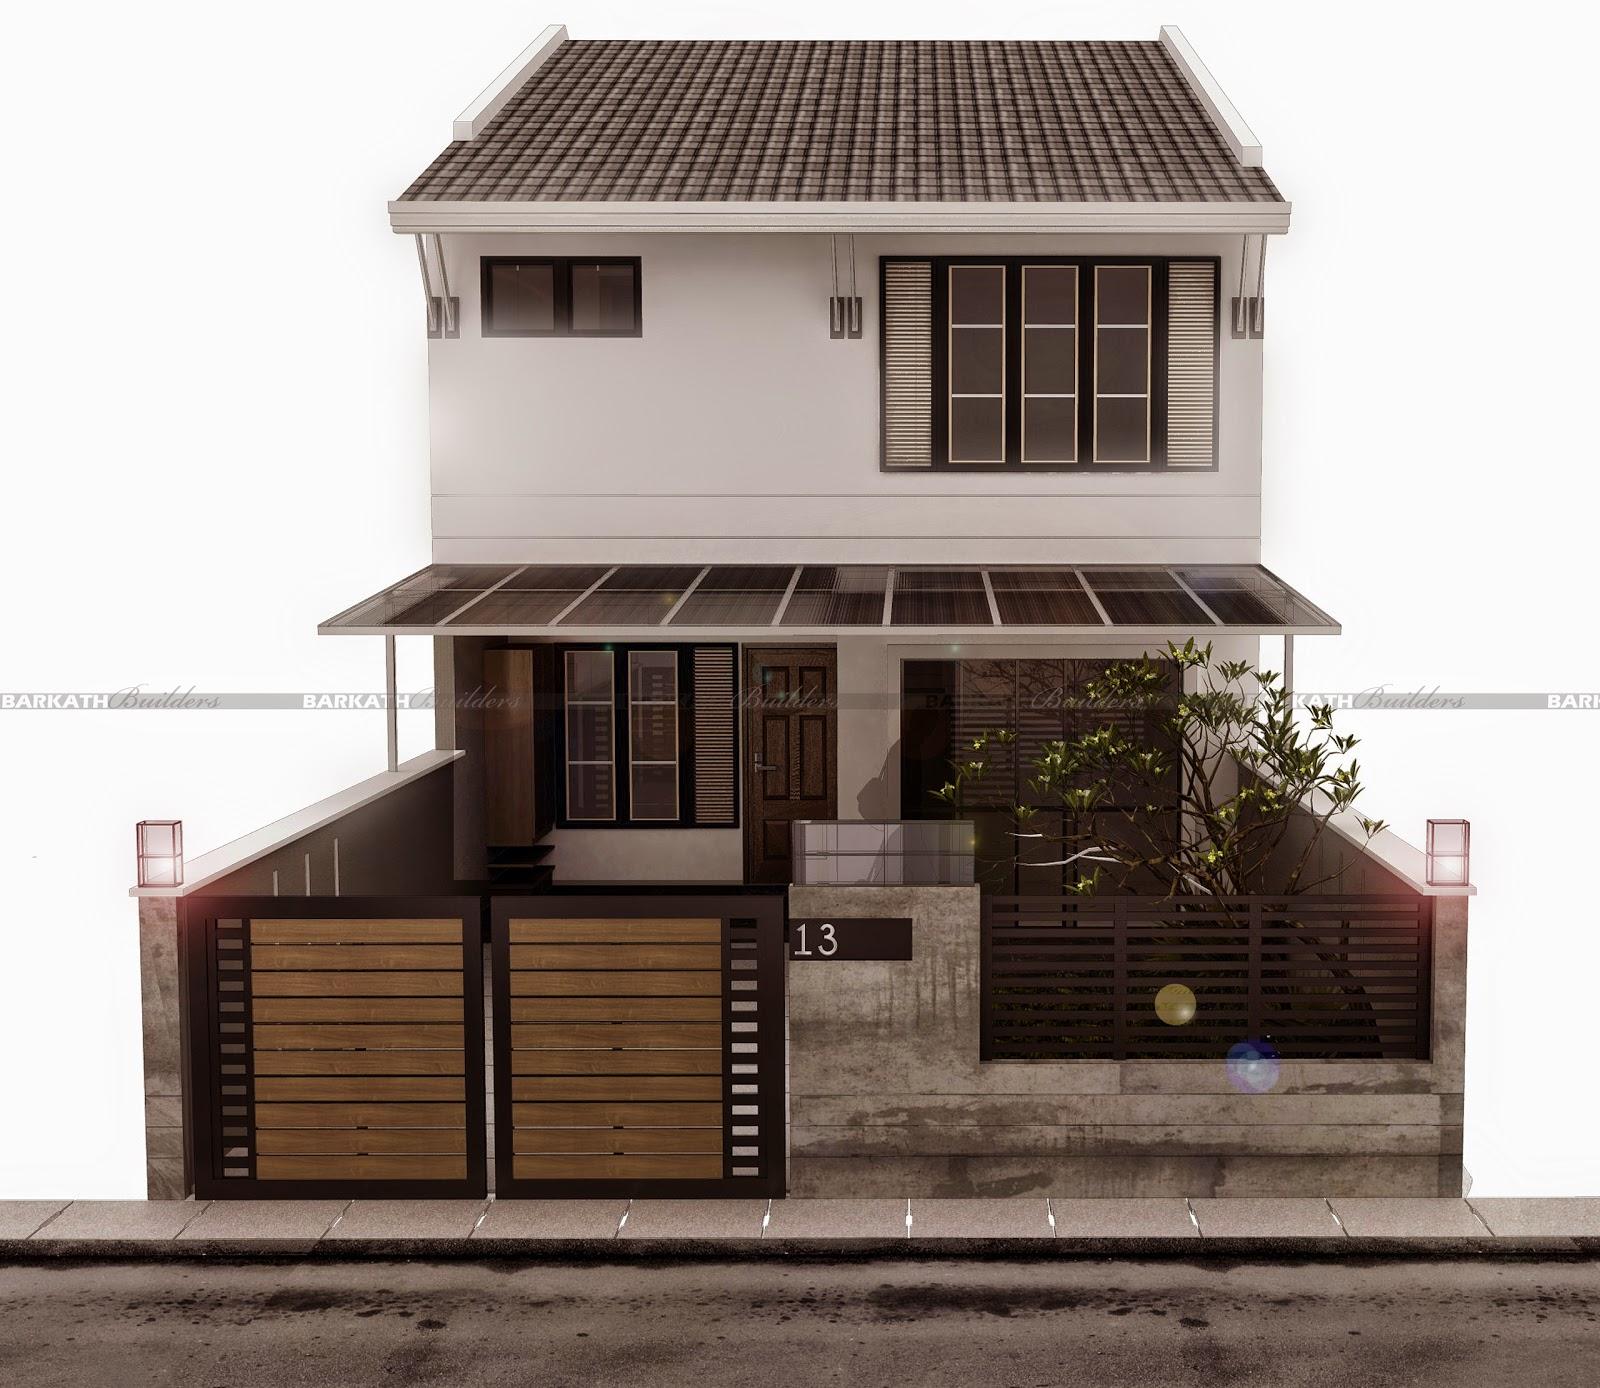 Projek Reka Bina Rumah Teres 2 Tingkat Berkonsepkan Moden Rastik